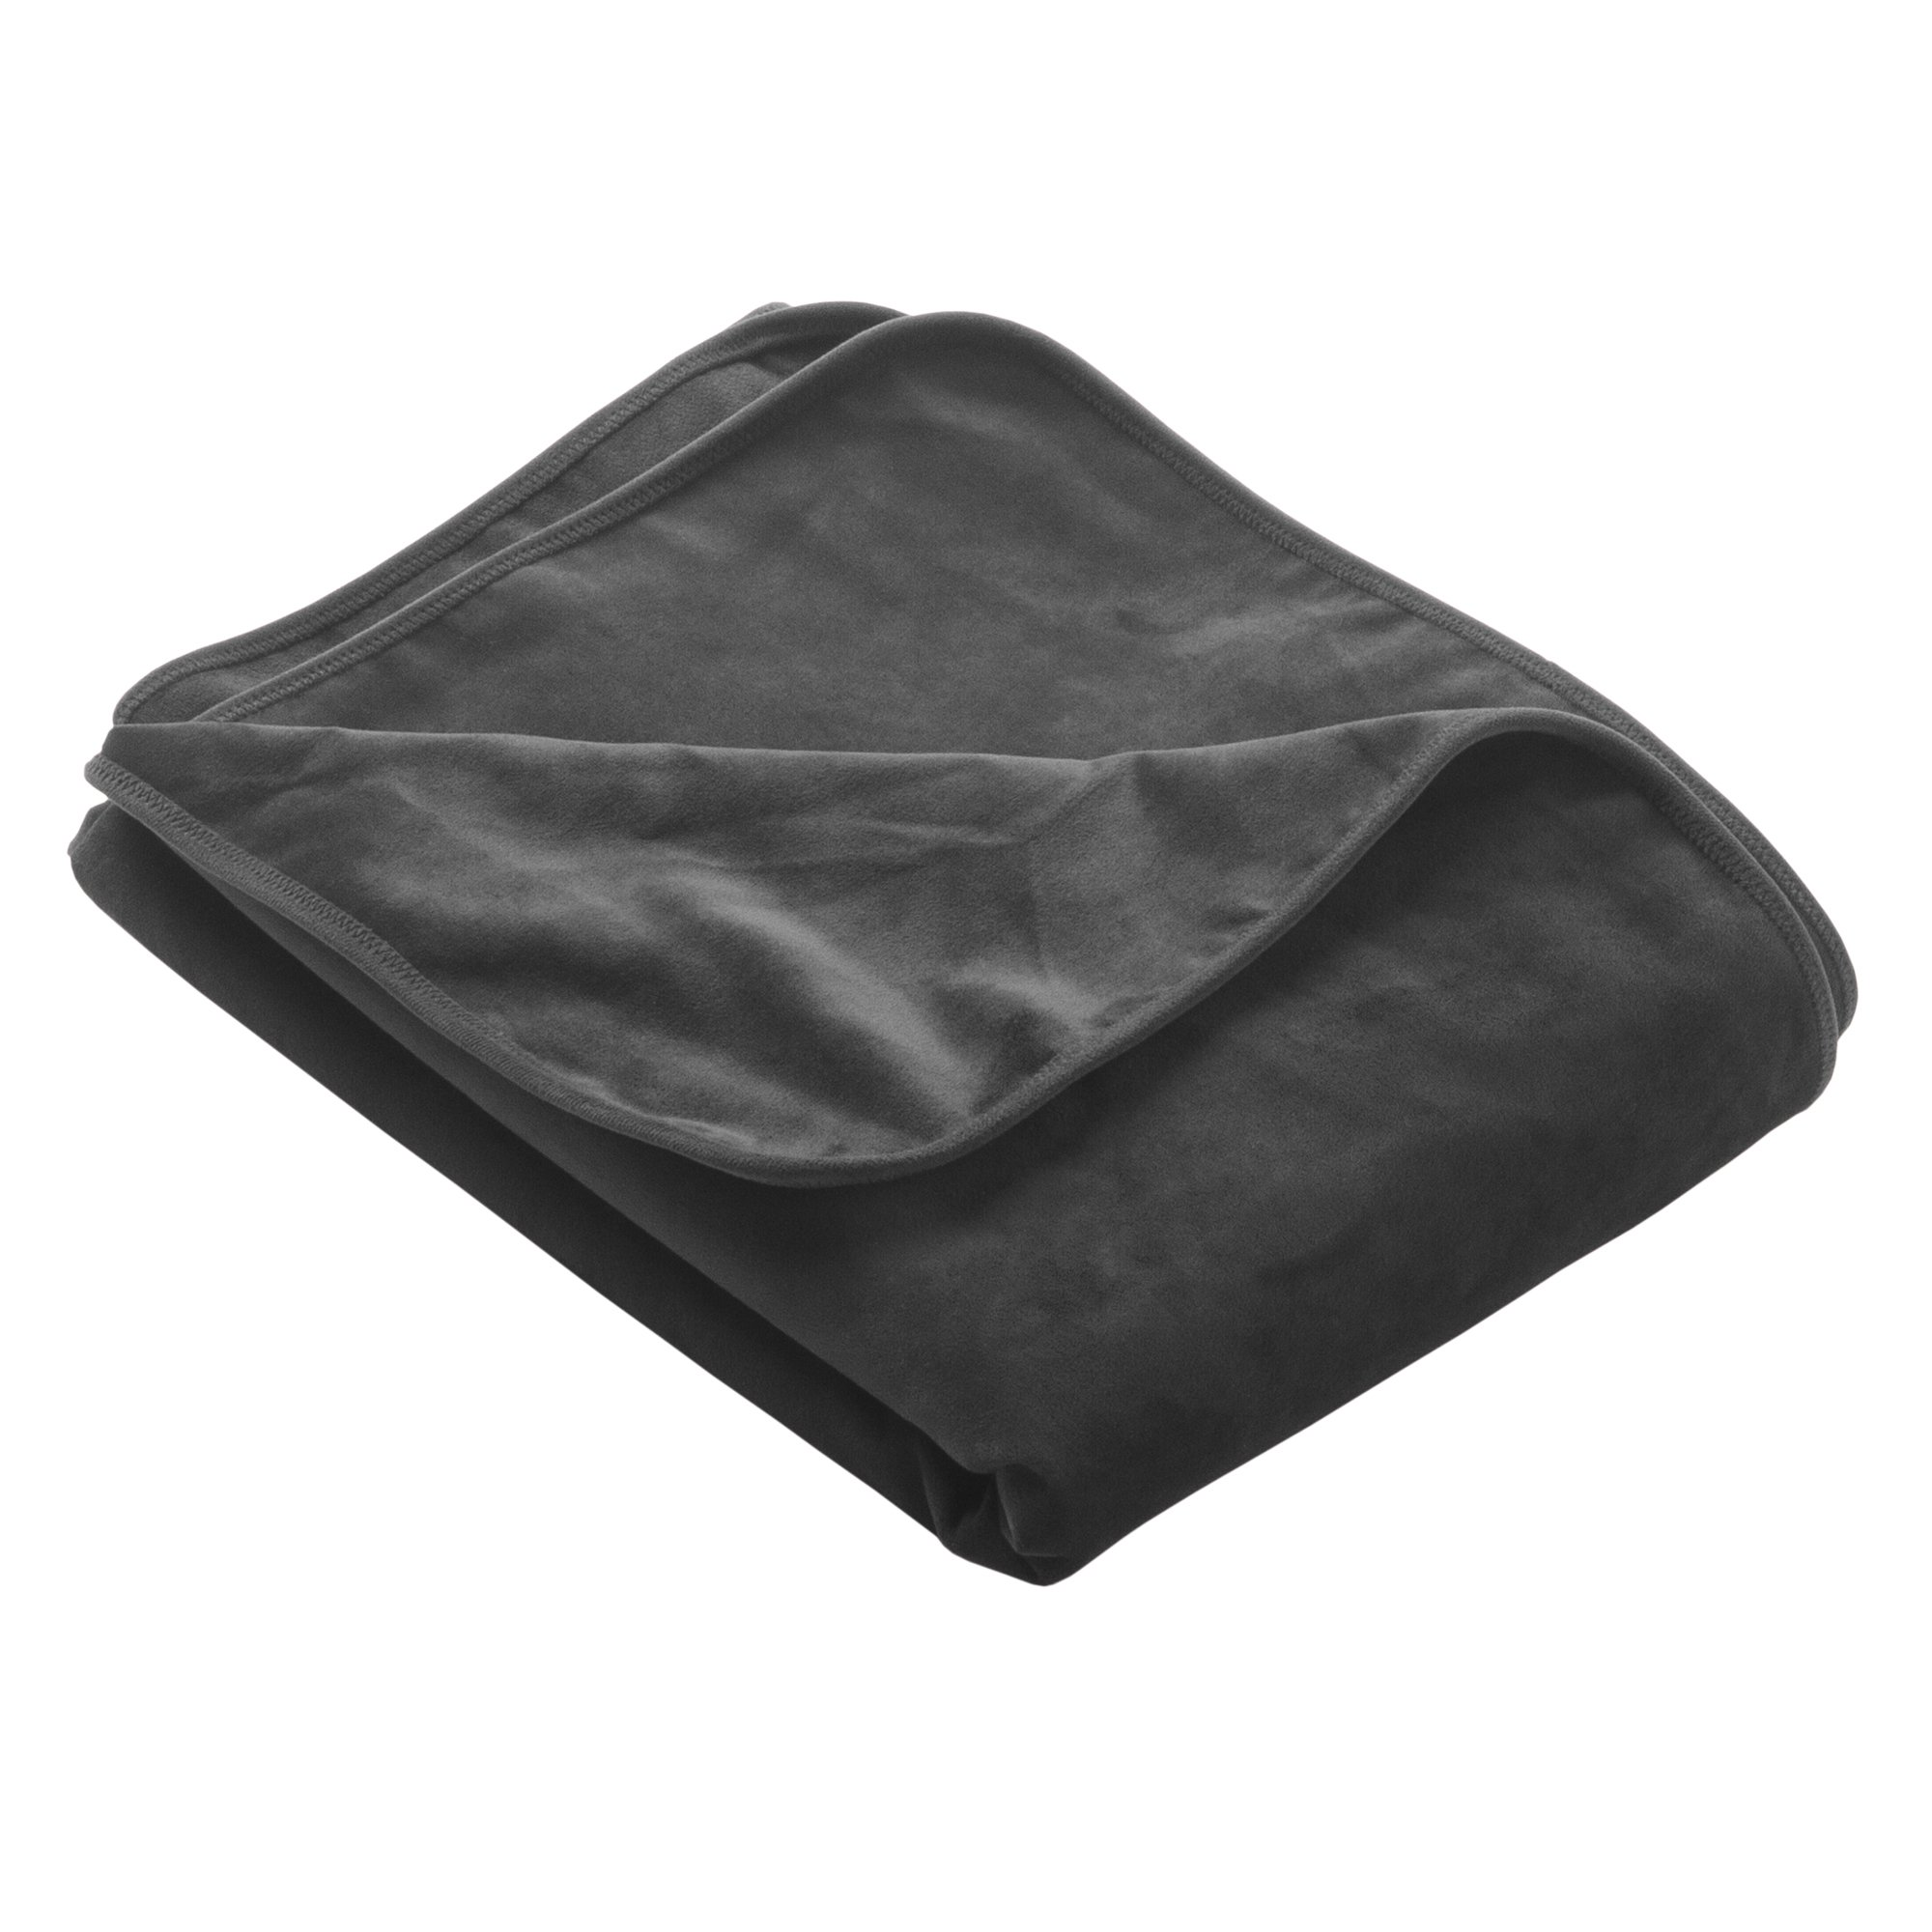 Liberator Fascinator Throe Moisture-Resistant Sex Blanket, King Size, Black by Liberator